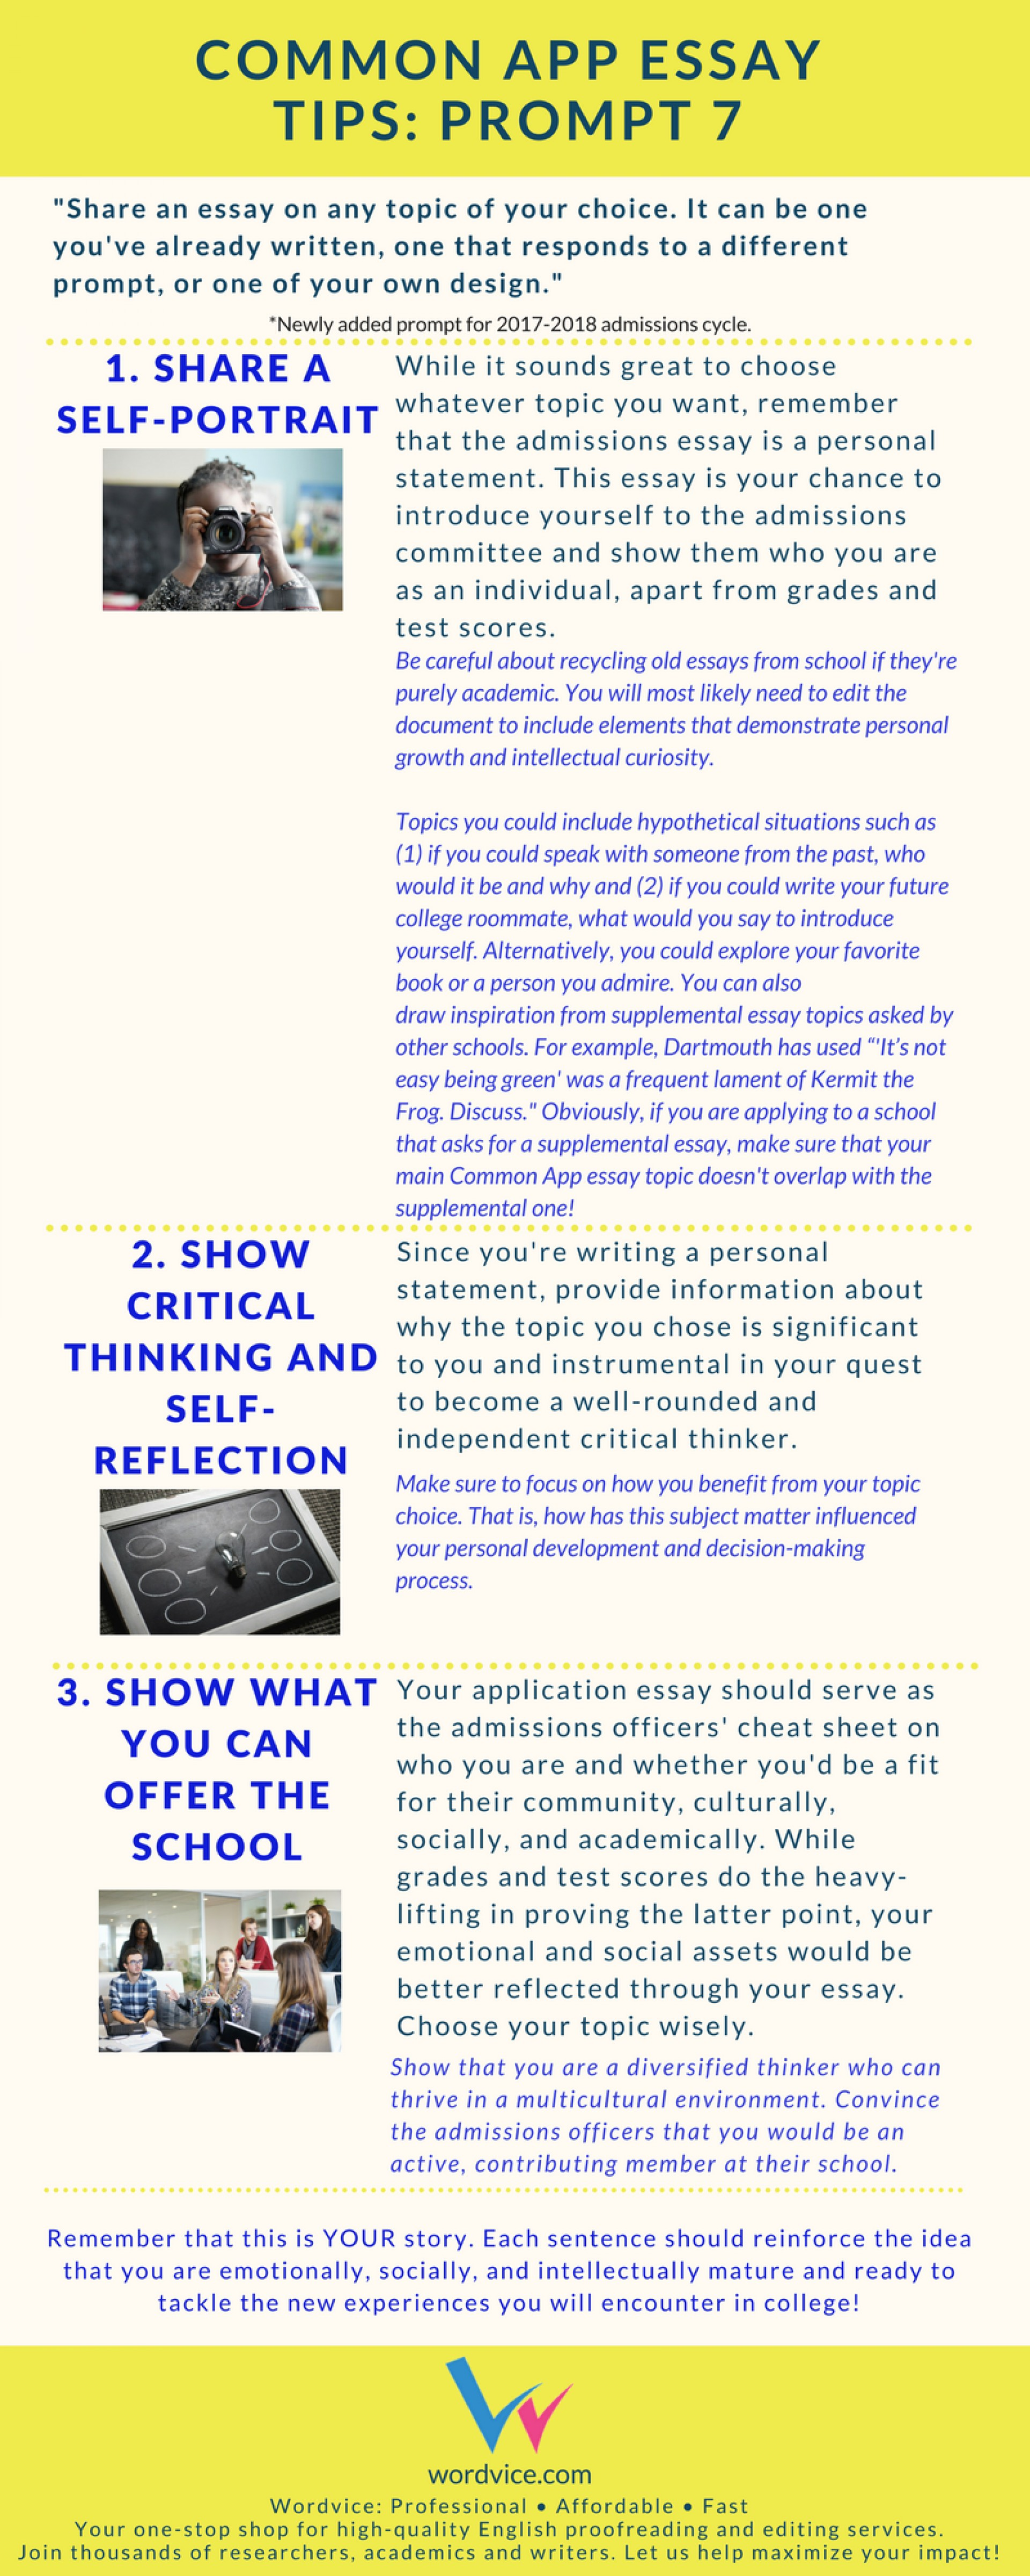 008 Common App Brainstormprompt Essay Example Unusual Prompt Prompts Usc Examples 1 4 1920